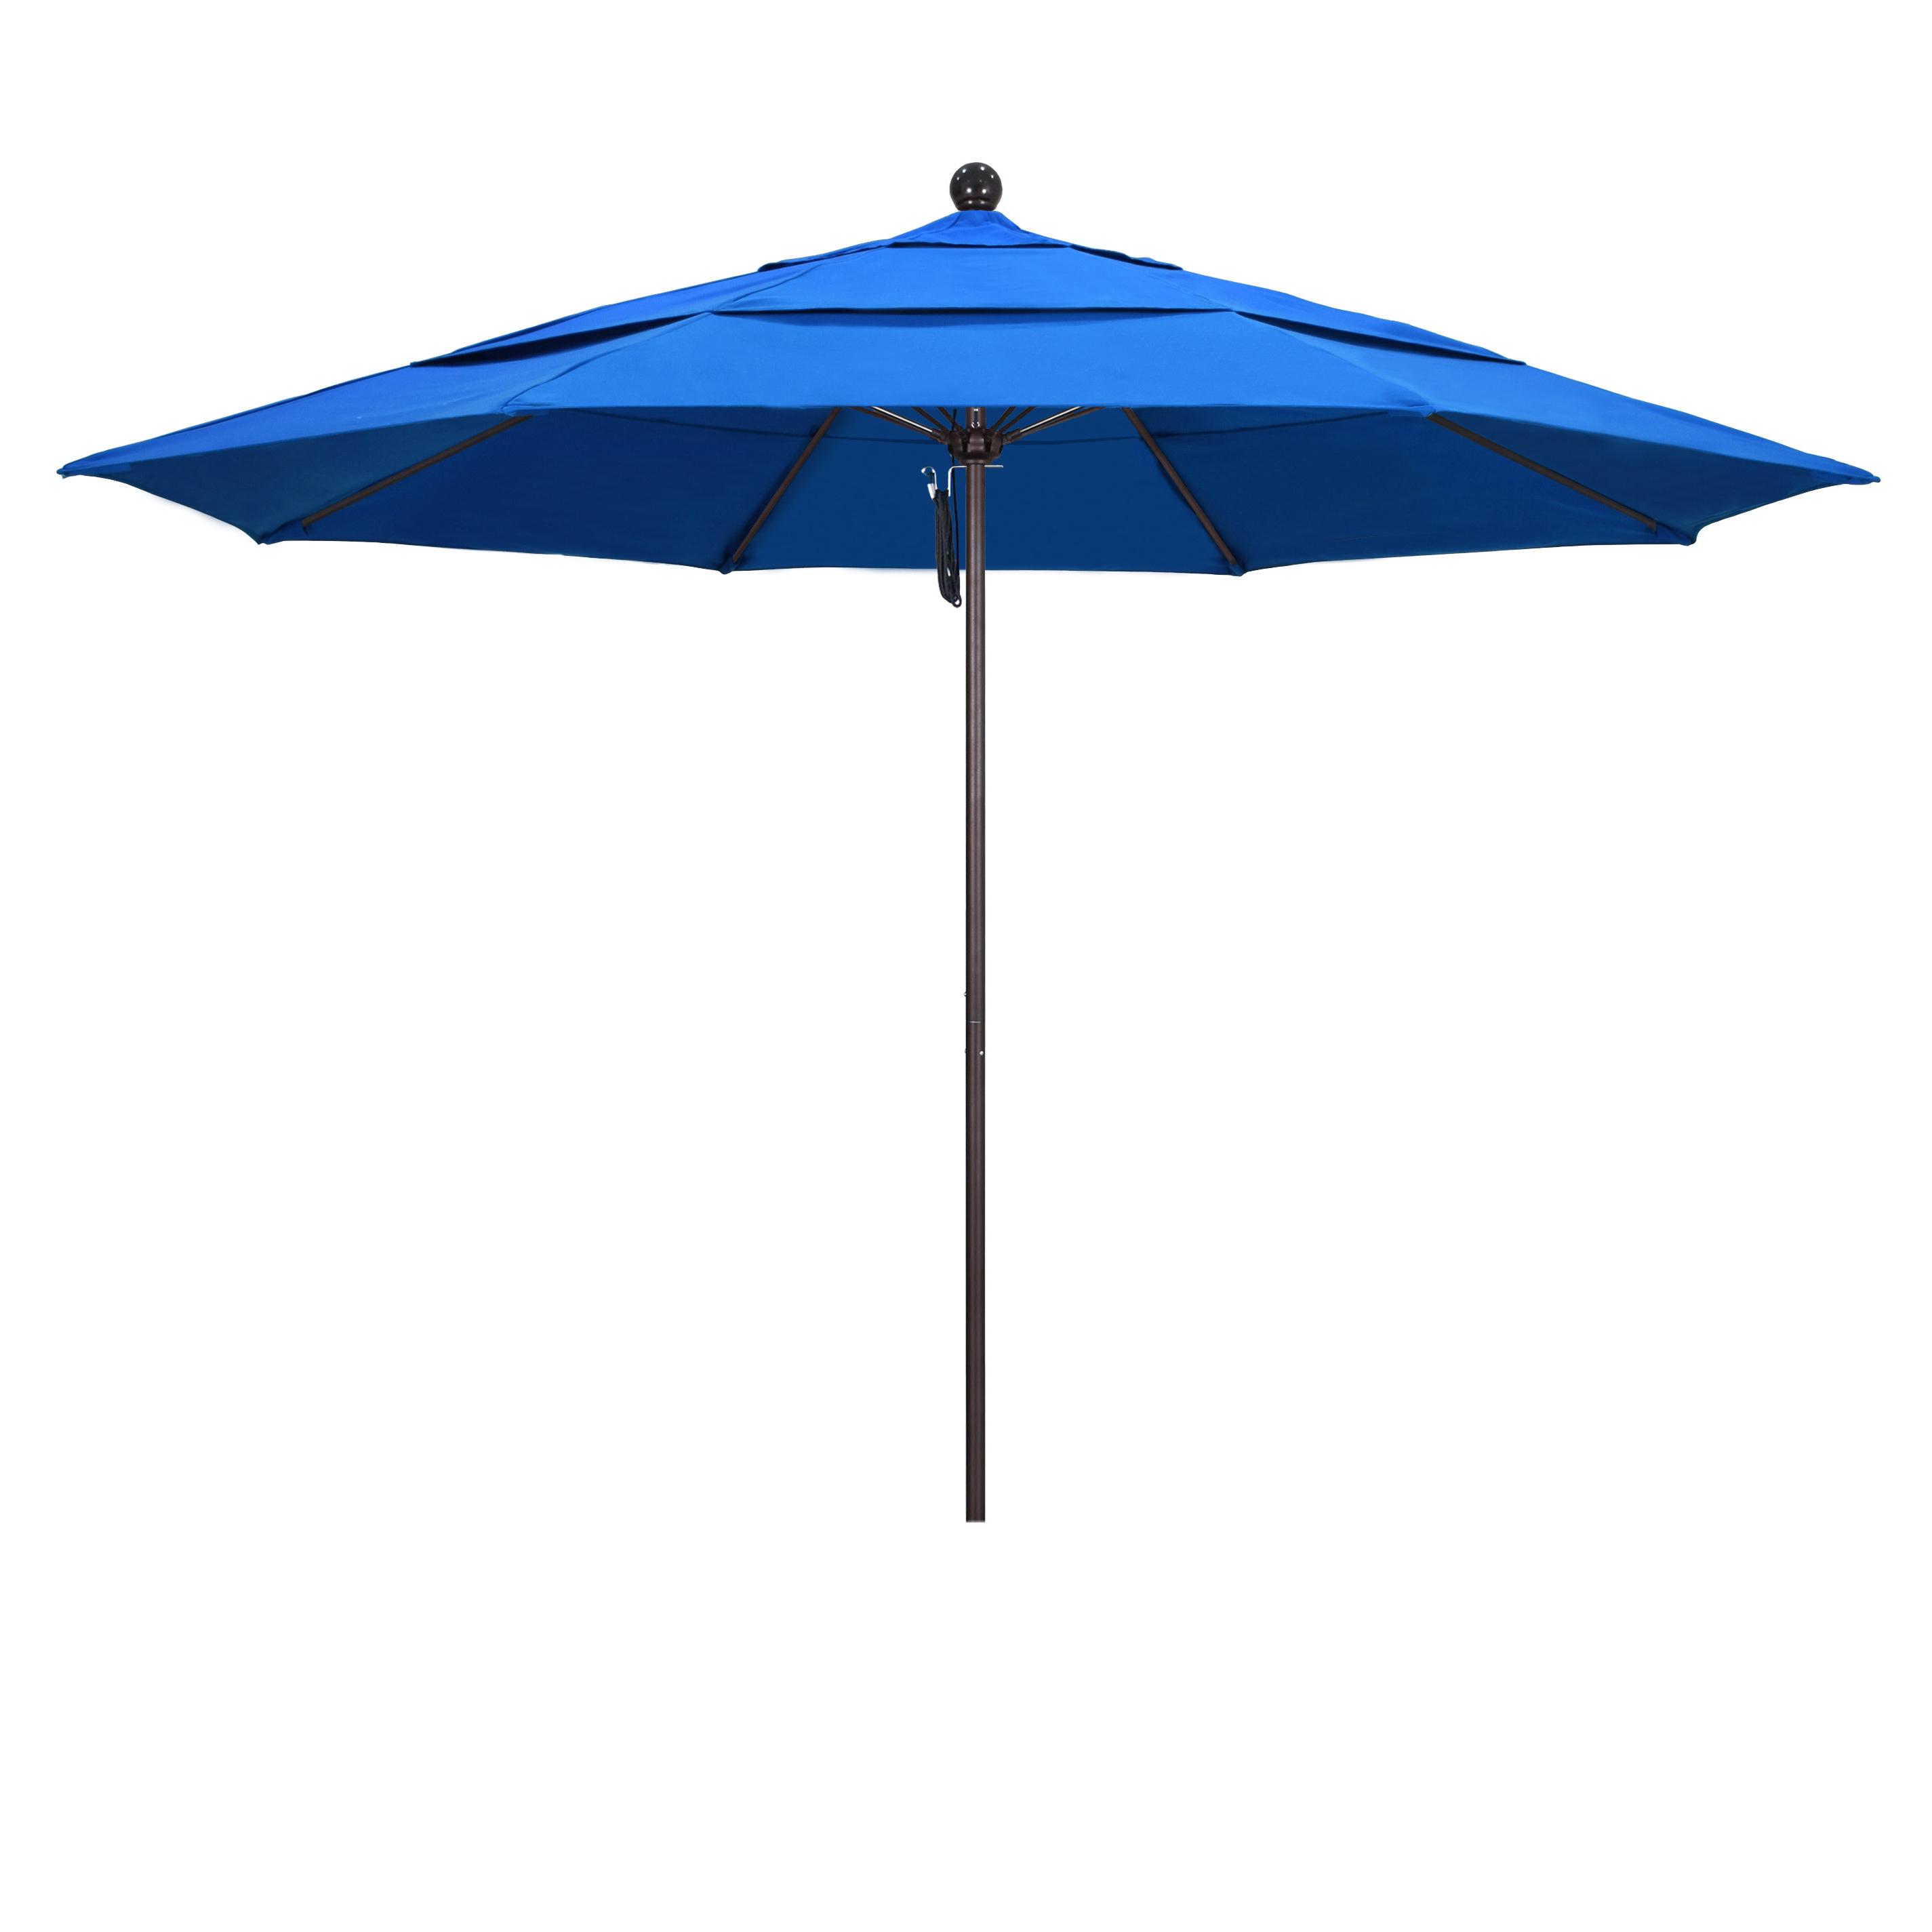 Caravelle Market Umbrellas Throughout Popular Benson 11' Market Umbrella (View 9 of 20)